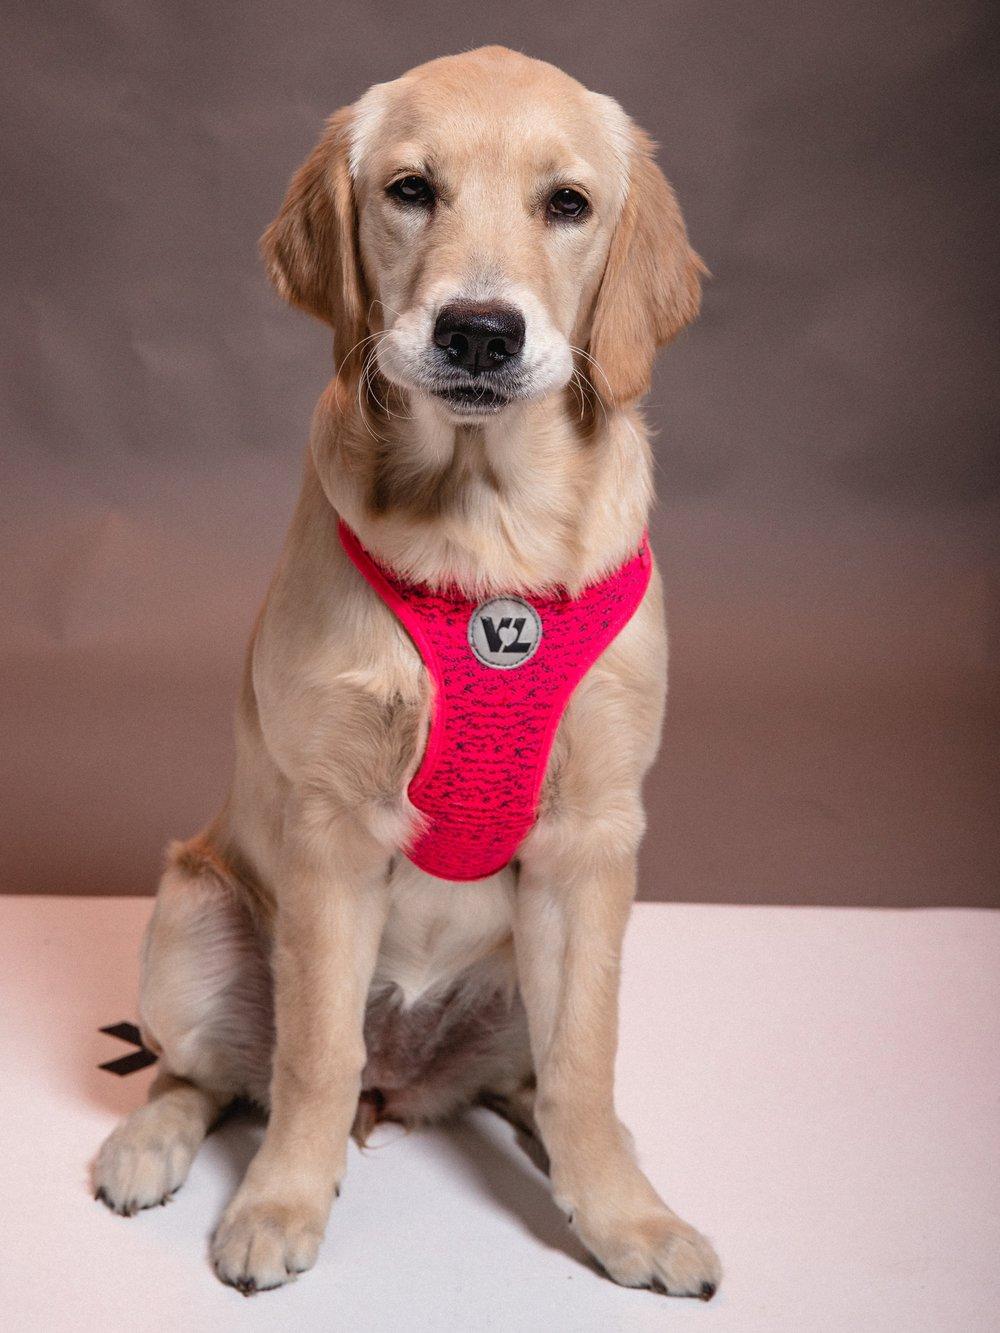 Sophie - Creative Motivator & Dog